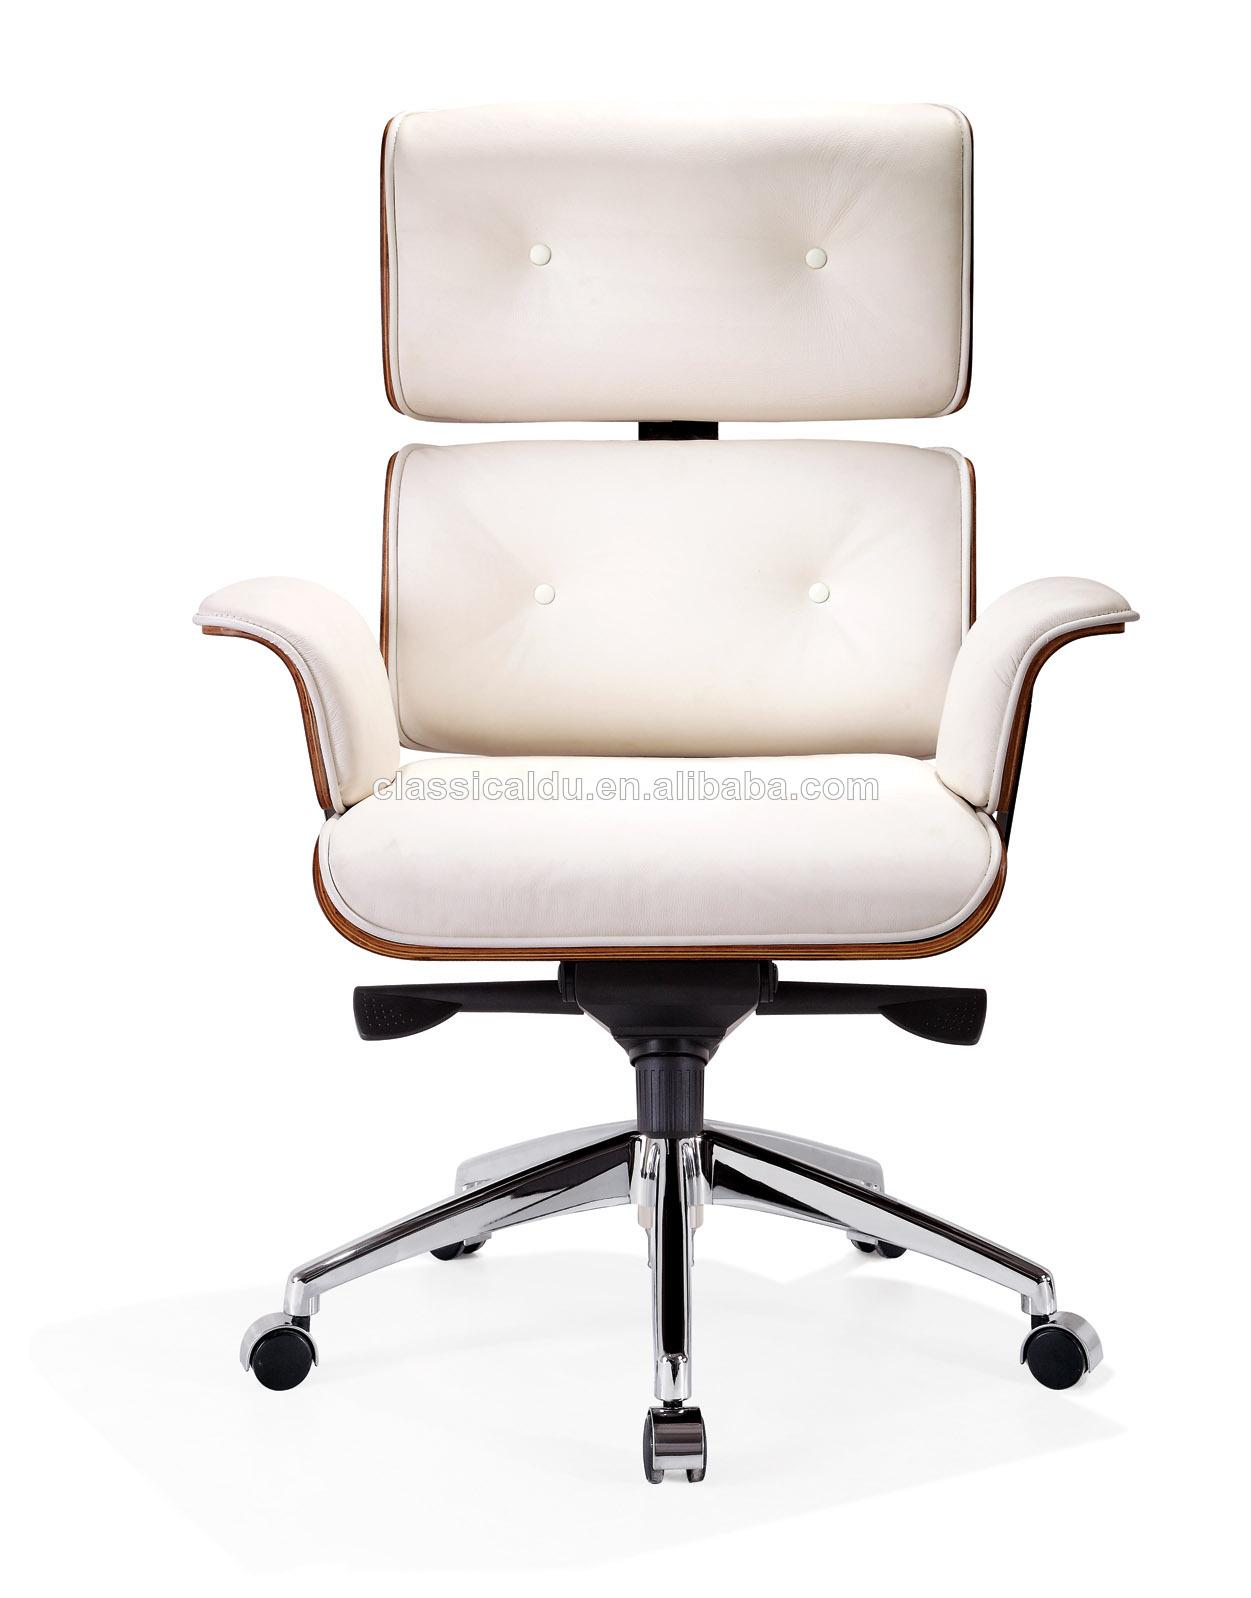 Silla ejecutiva, silla de diseño de, de ala alta sillas de respaldo ...